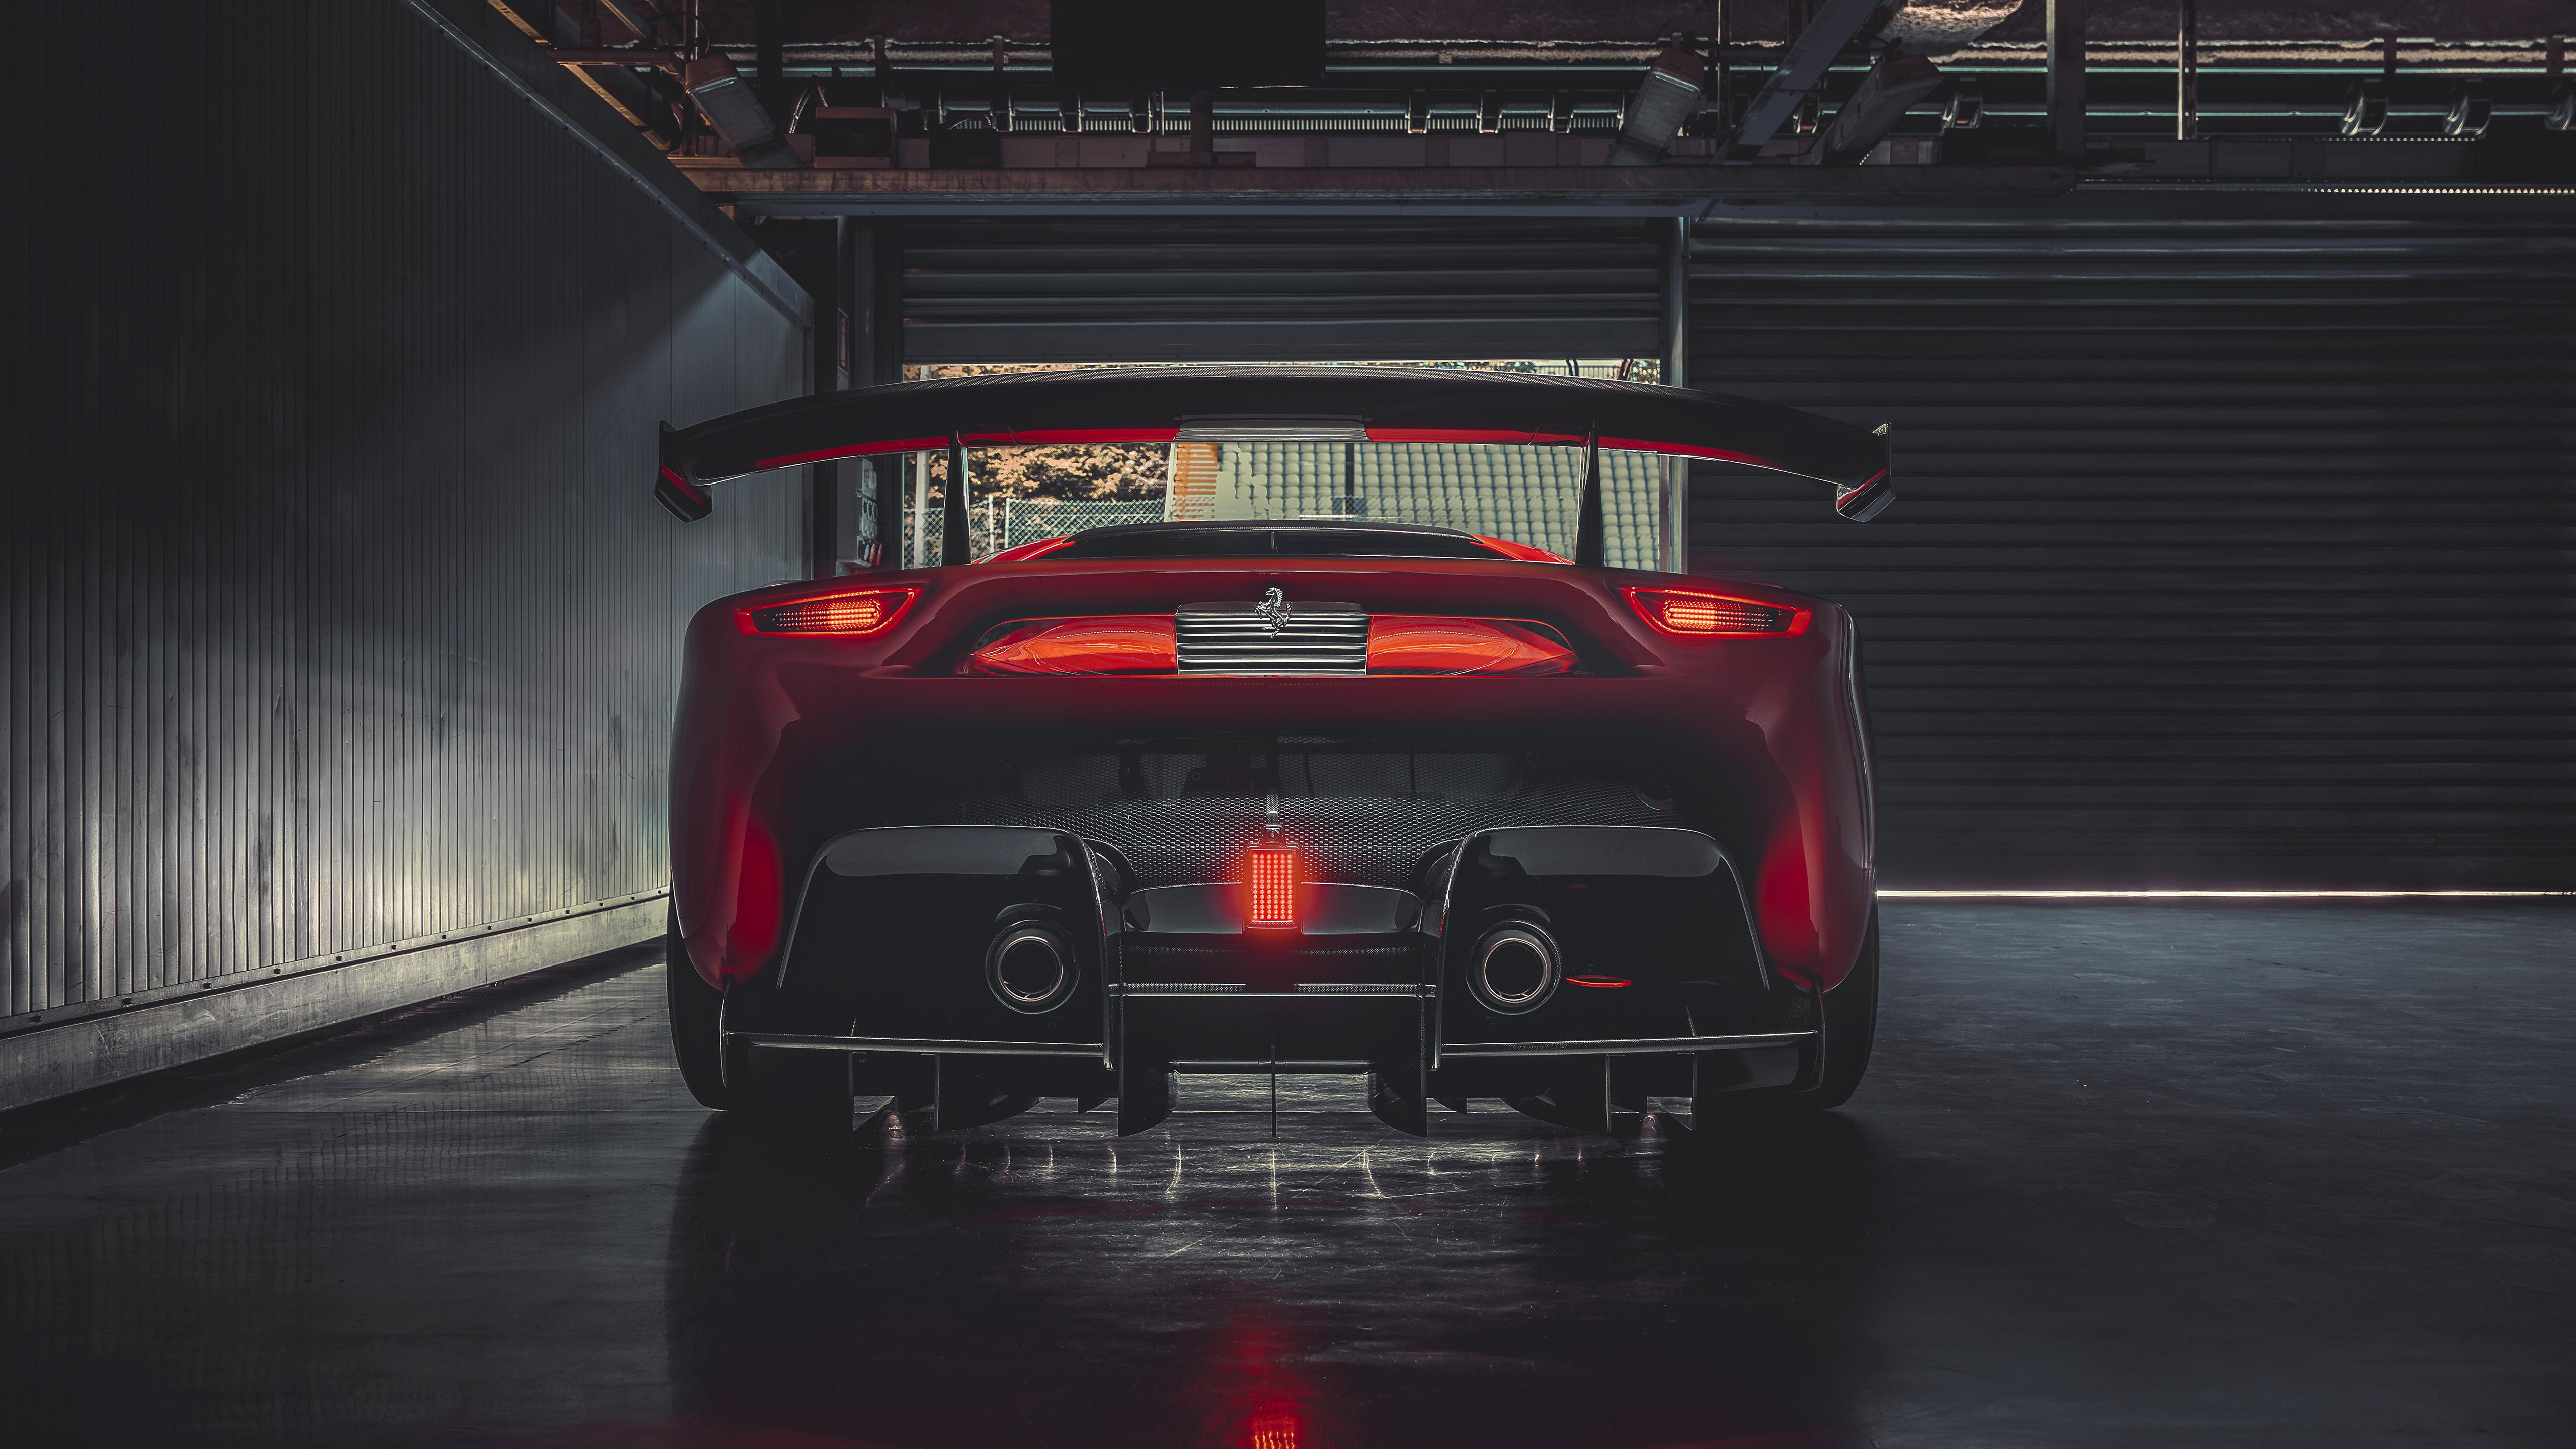 Ferrari P80c 2019 4k 2 Wallpaper Hd Car Wallpapers Id 13242